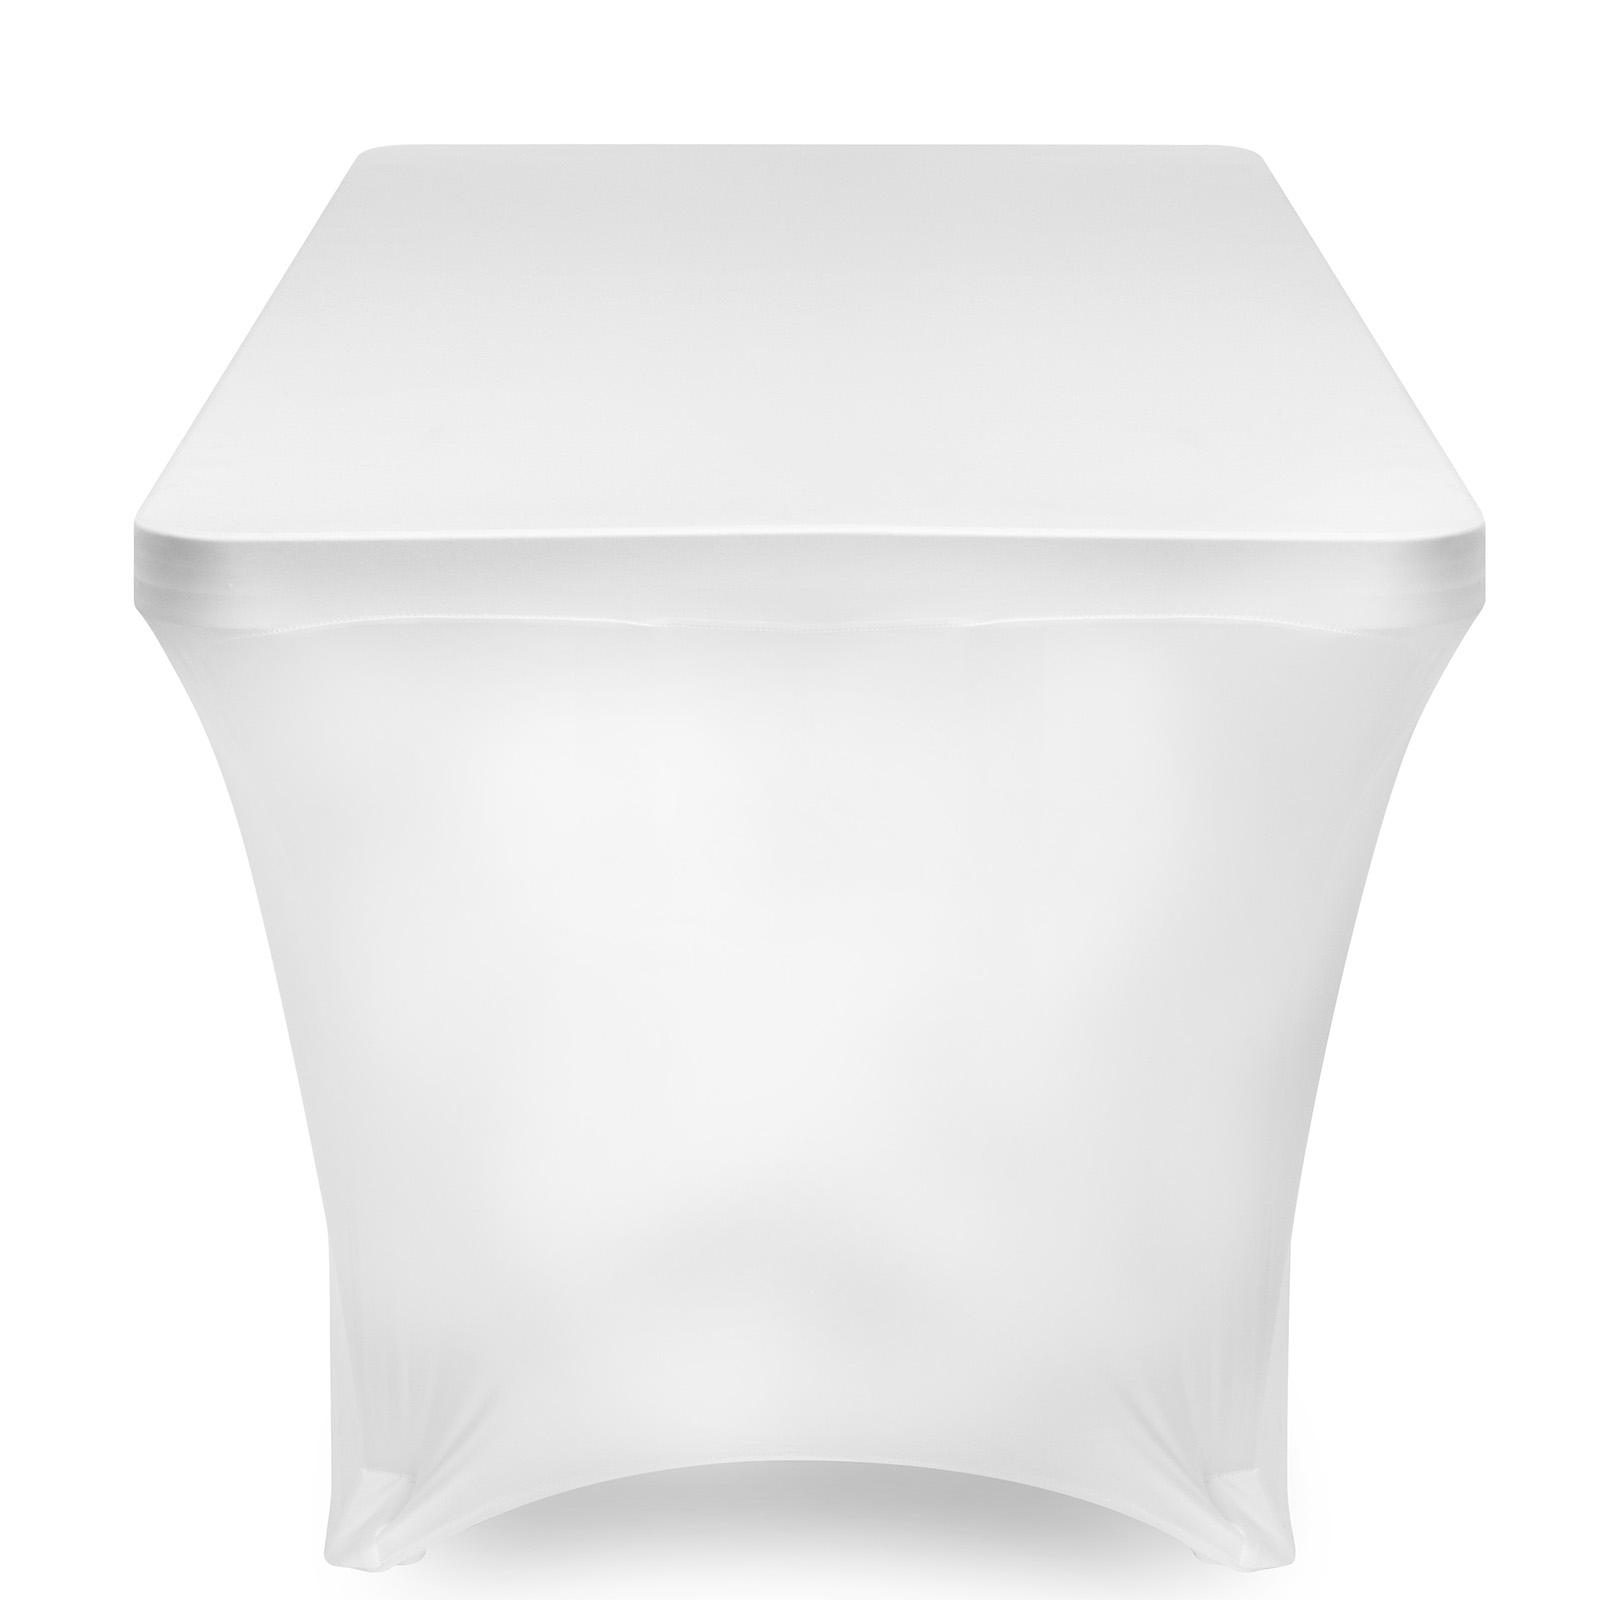 Superb Lanns Linens 4 Fitted Stretch Tablecloth For 48 X 24 Rectangular Table Wedding Banquet Trade Show Spandex Cloth Fabric Cover White Spiritservingveterans Wood Chair Design Ideas Spiritservingveteransorg